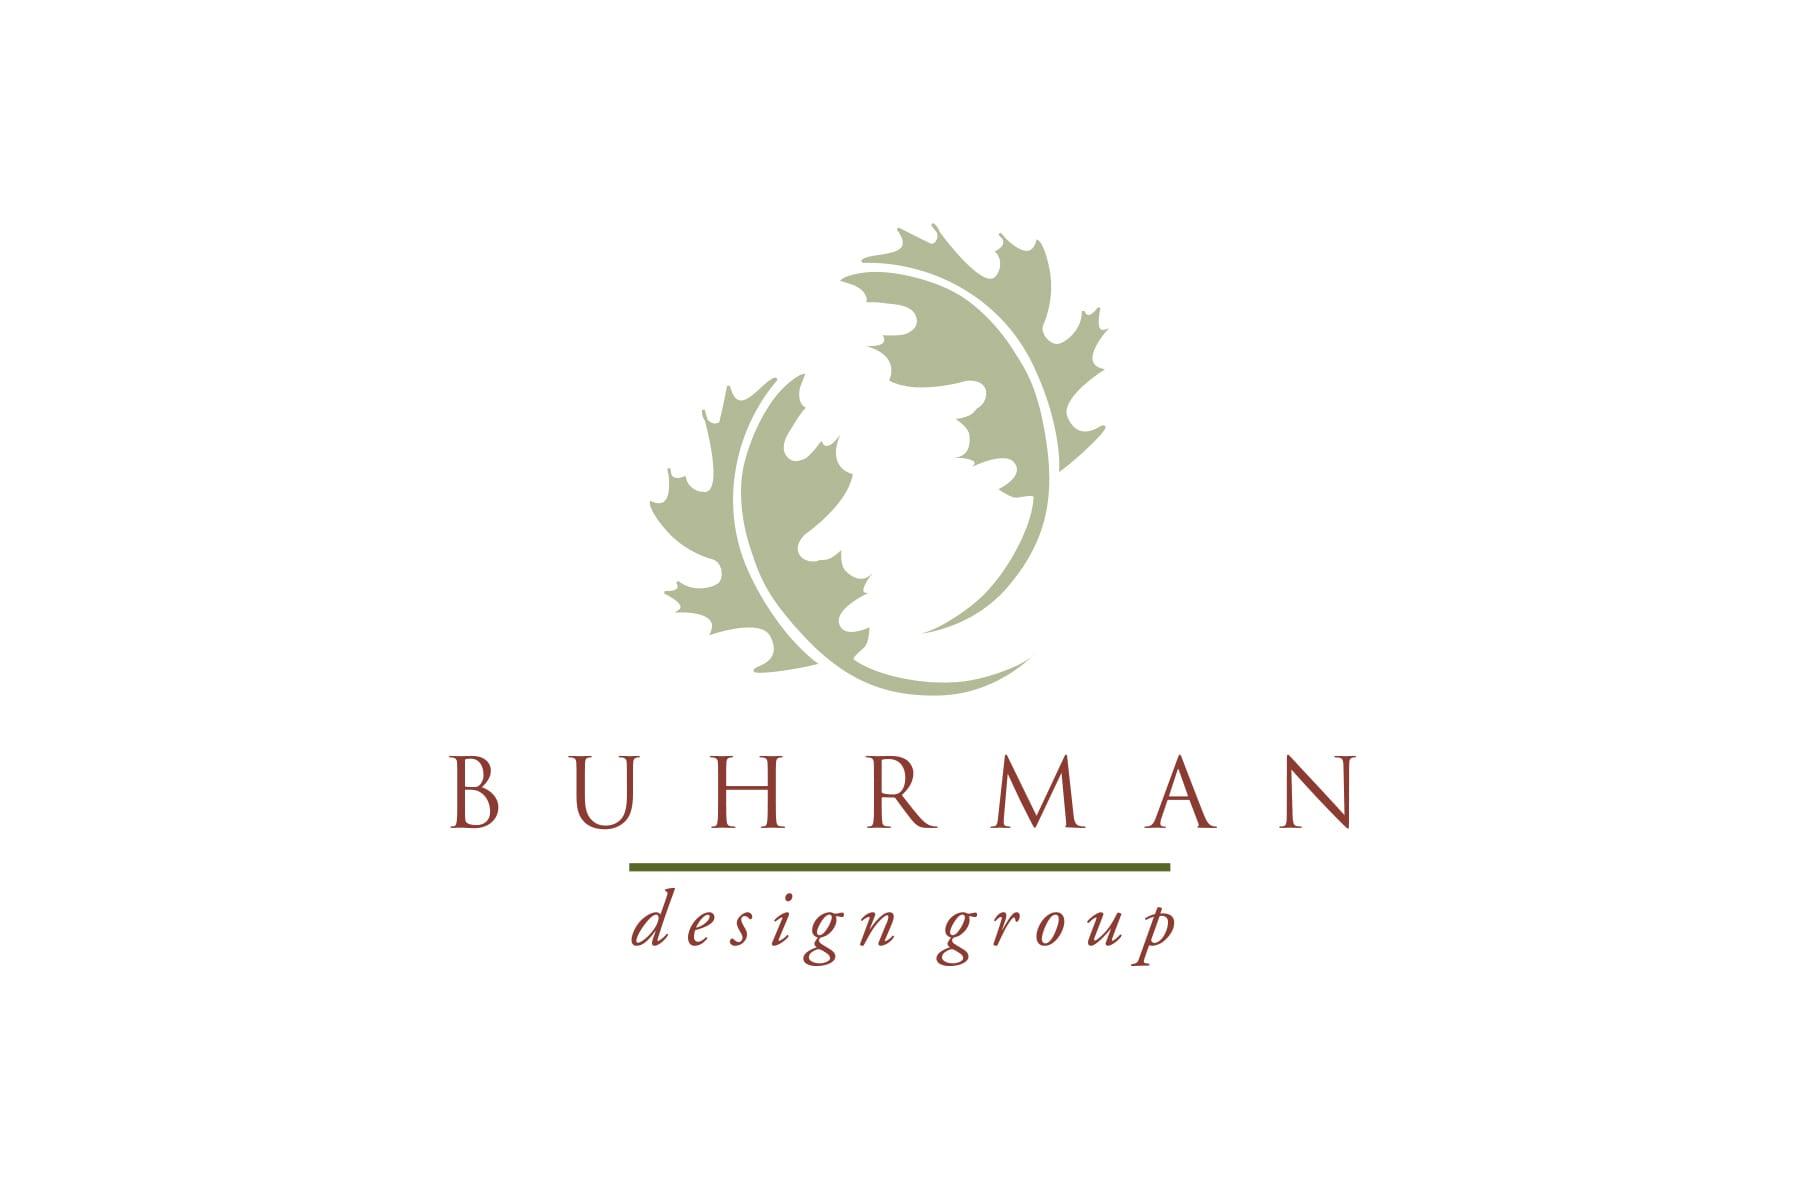 buhrman-logo